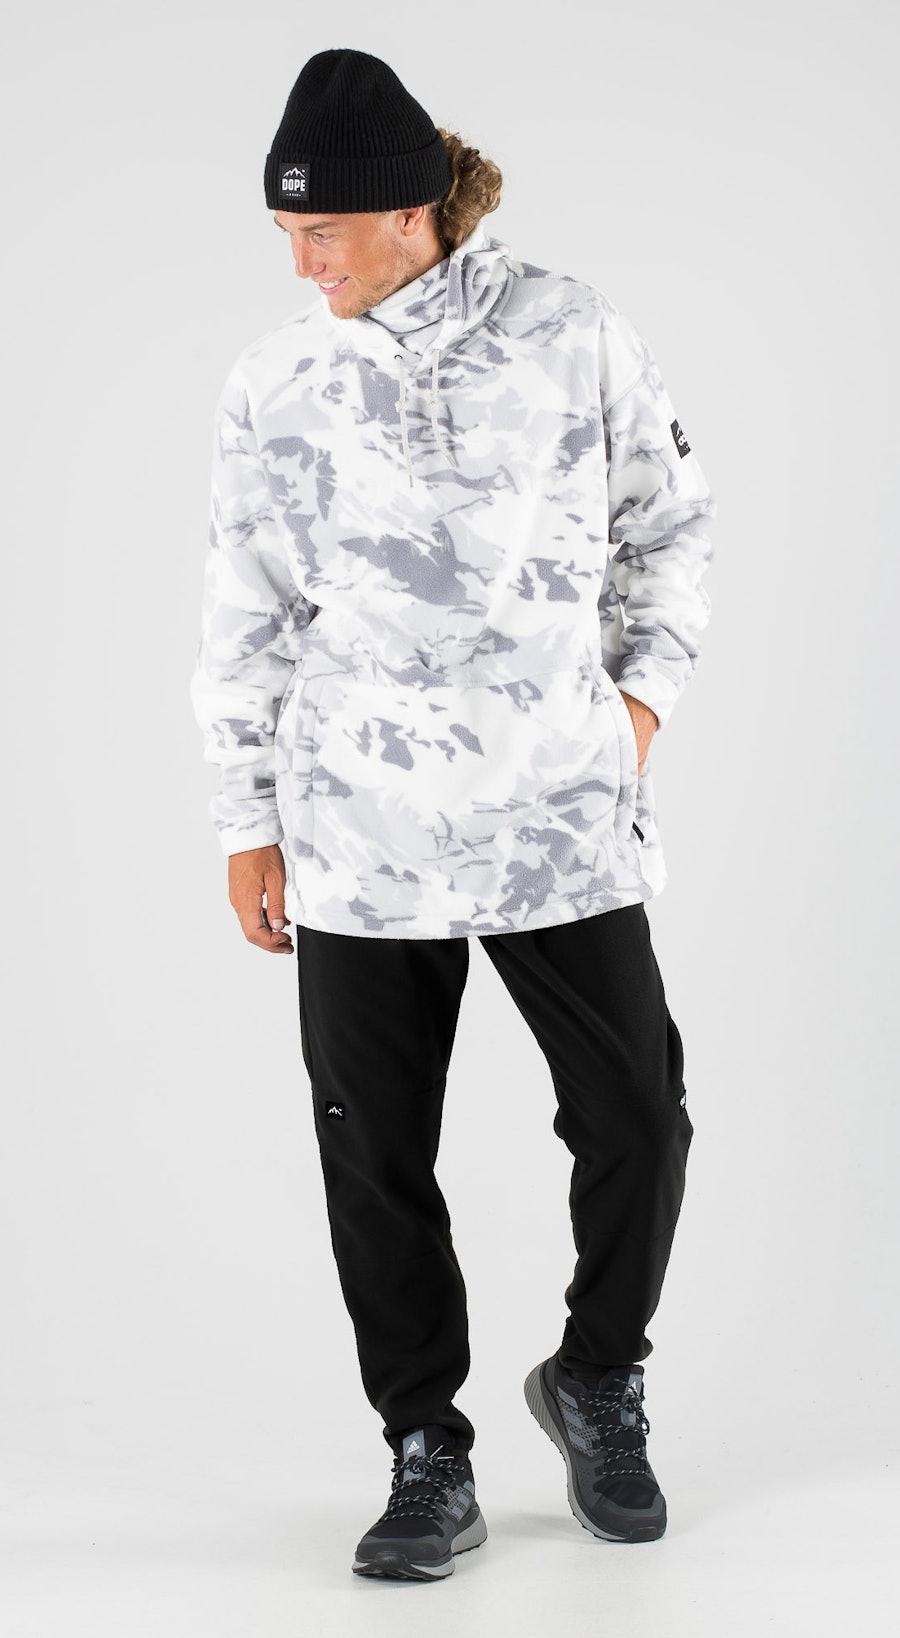 Dope Cozy II Tucks Camo Outfit Multi